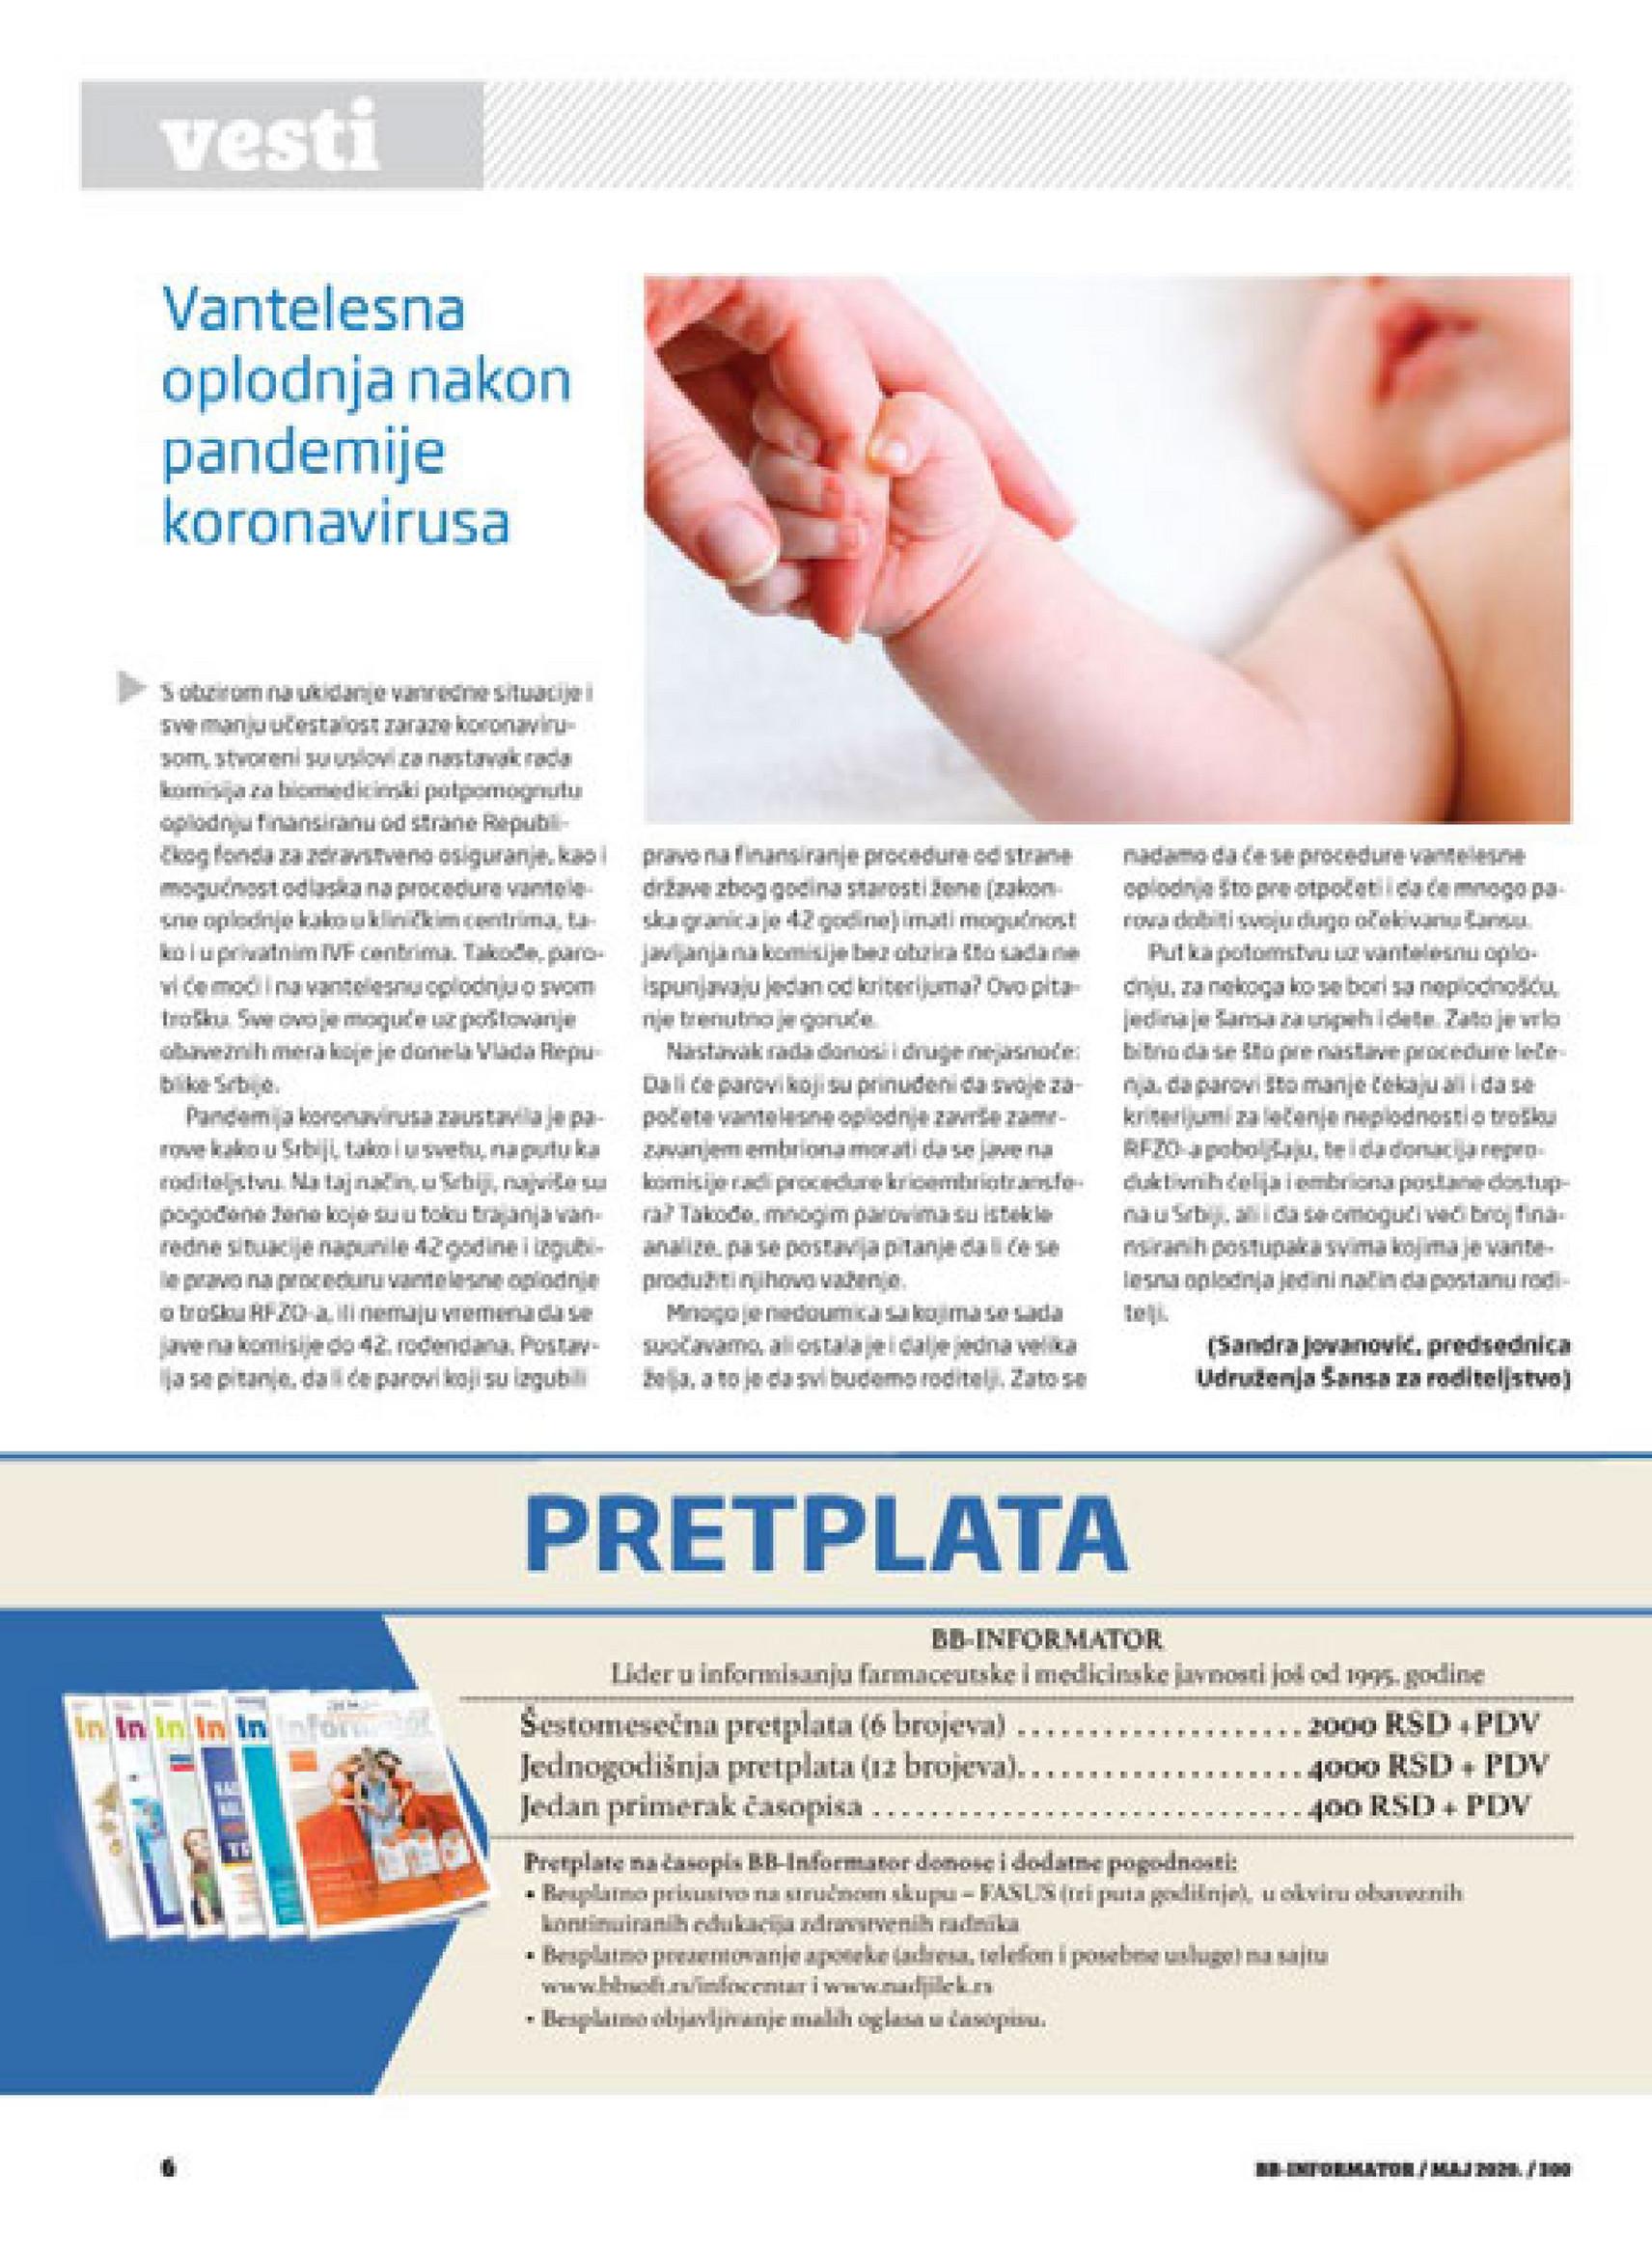 inkstų profilaktika hipertenzijos atveju